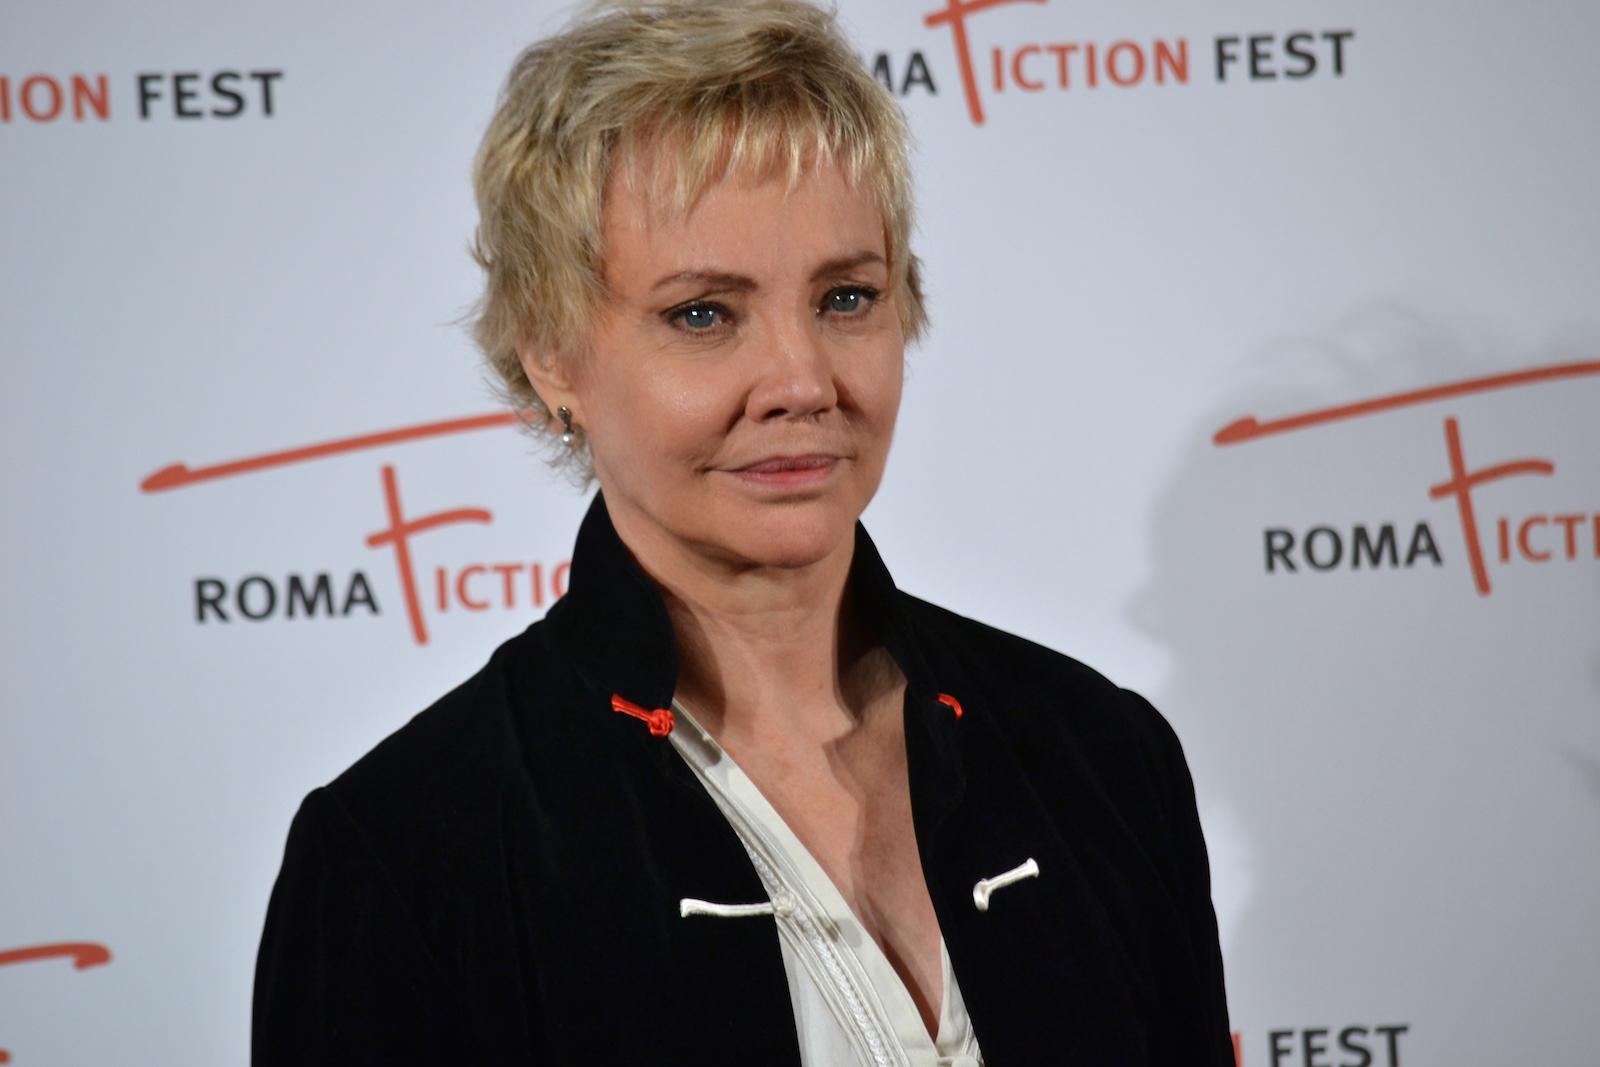 Roma Fiction Fest 2015: Carole André sul red carpet di Sandokan